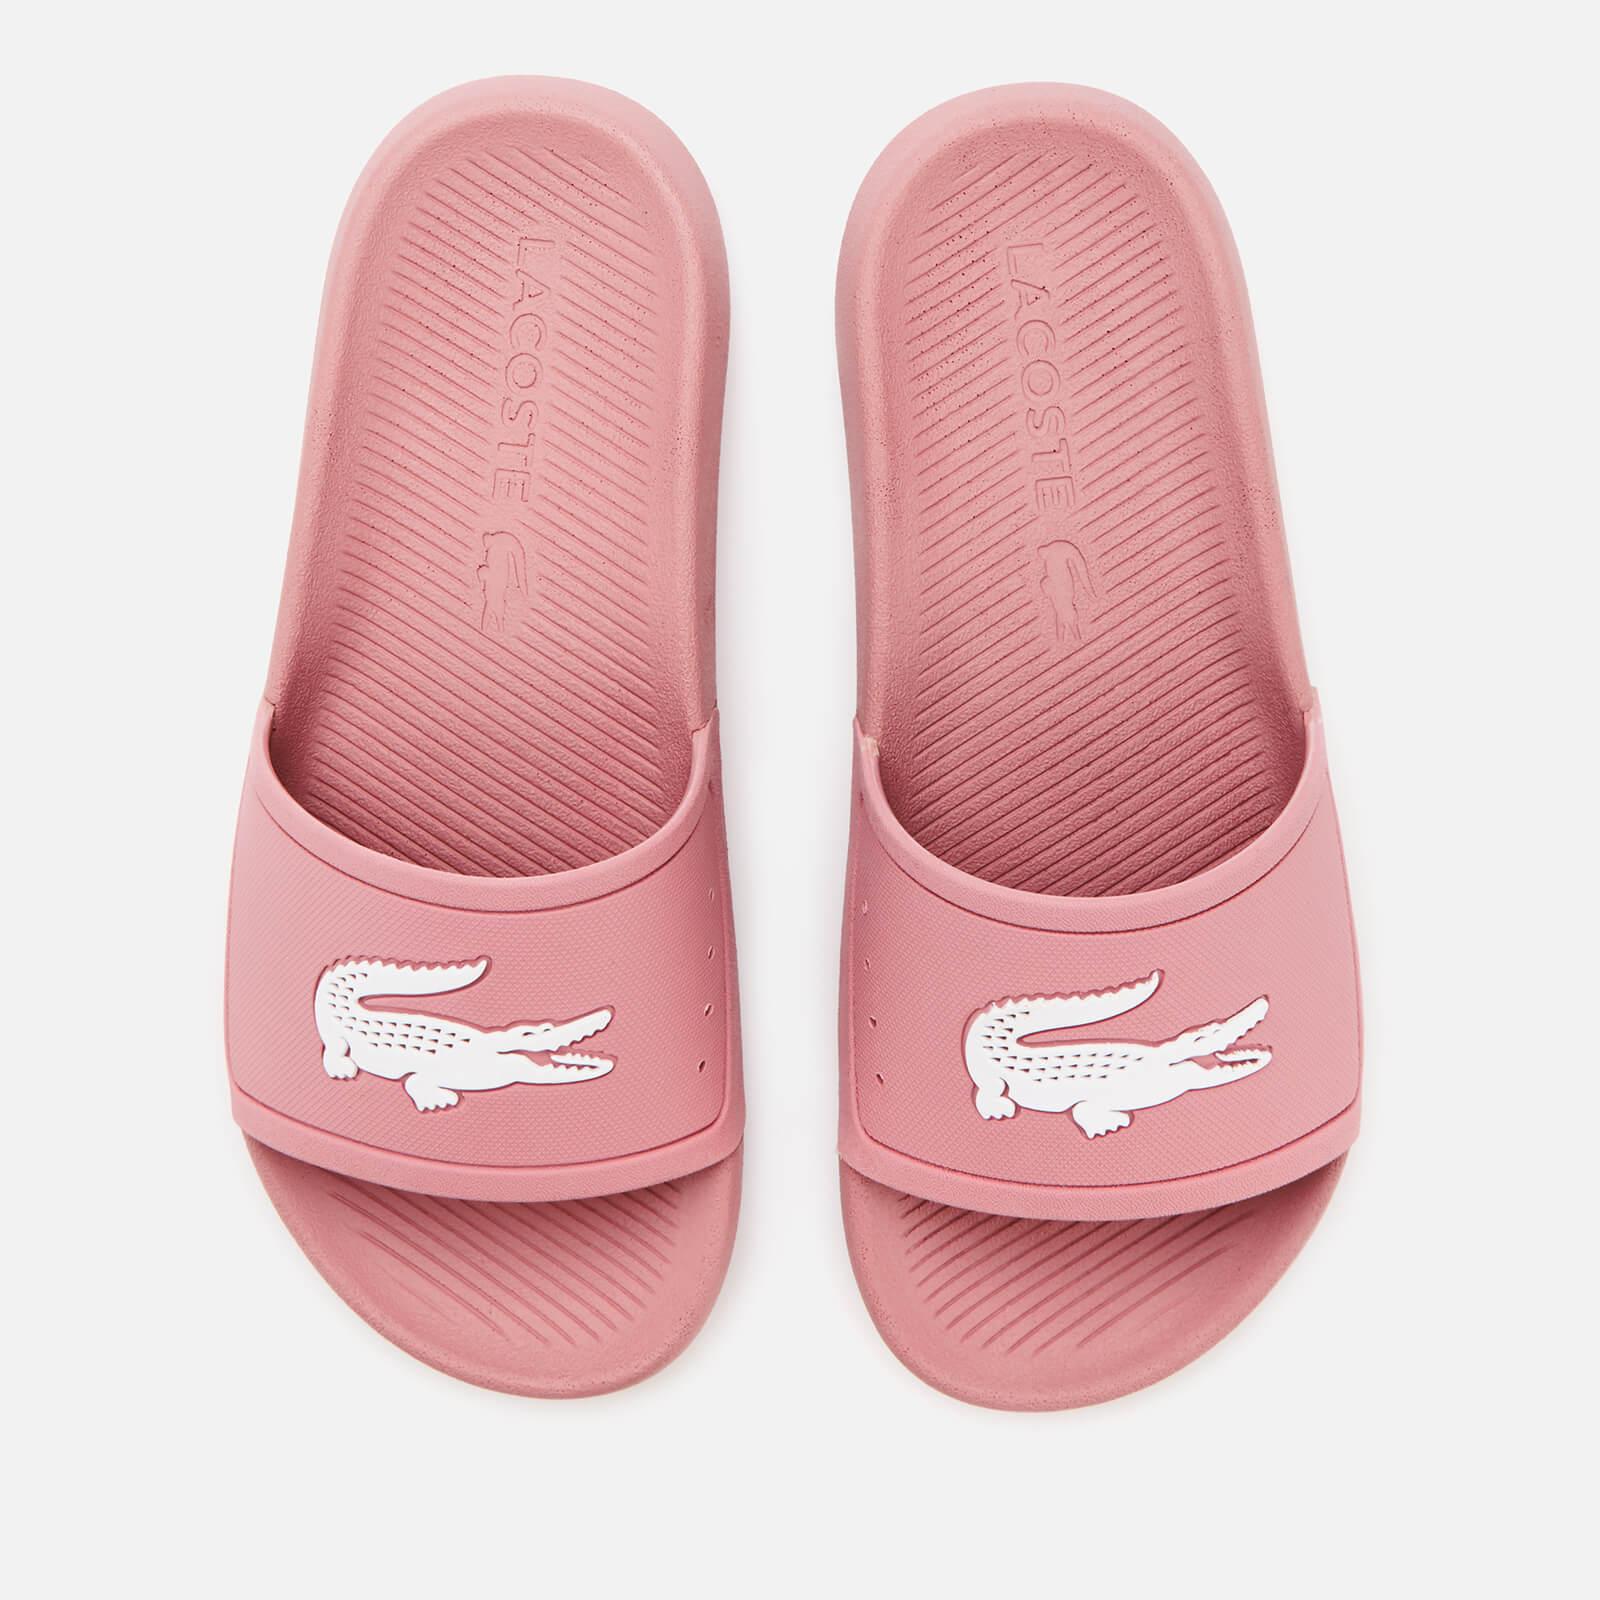 Lacoste Women's Croco Slide Sandals - Pink/White - UK 8